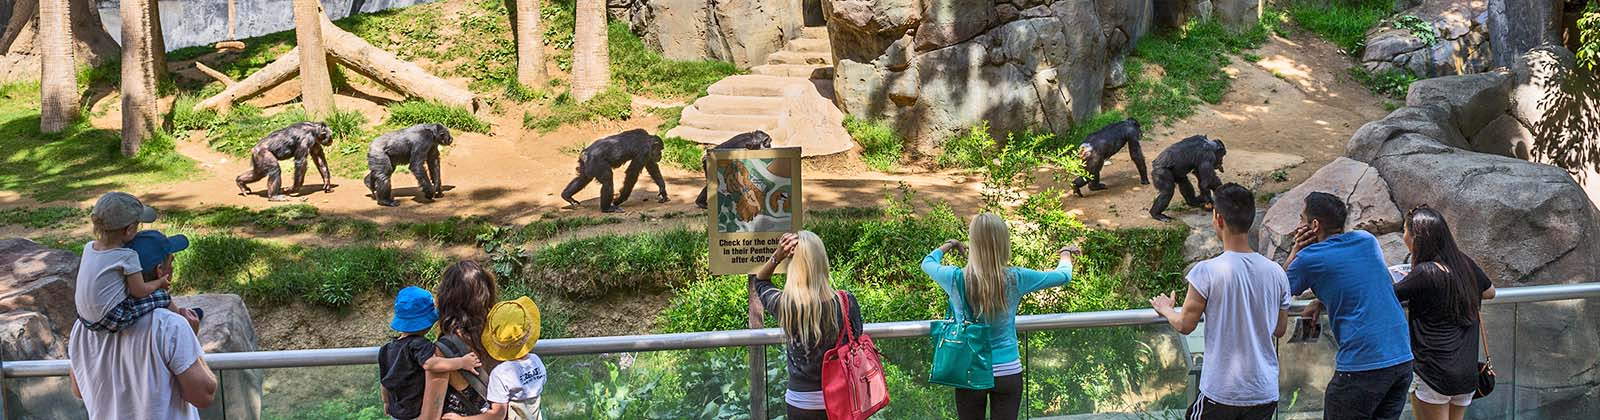 Los Angeles Zoo - Family Membership - Image 1